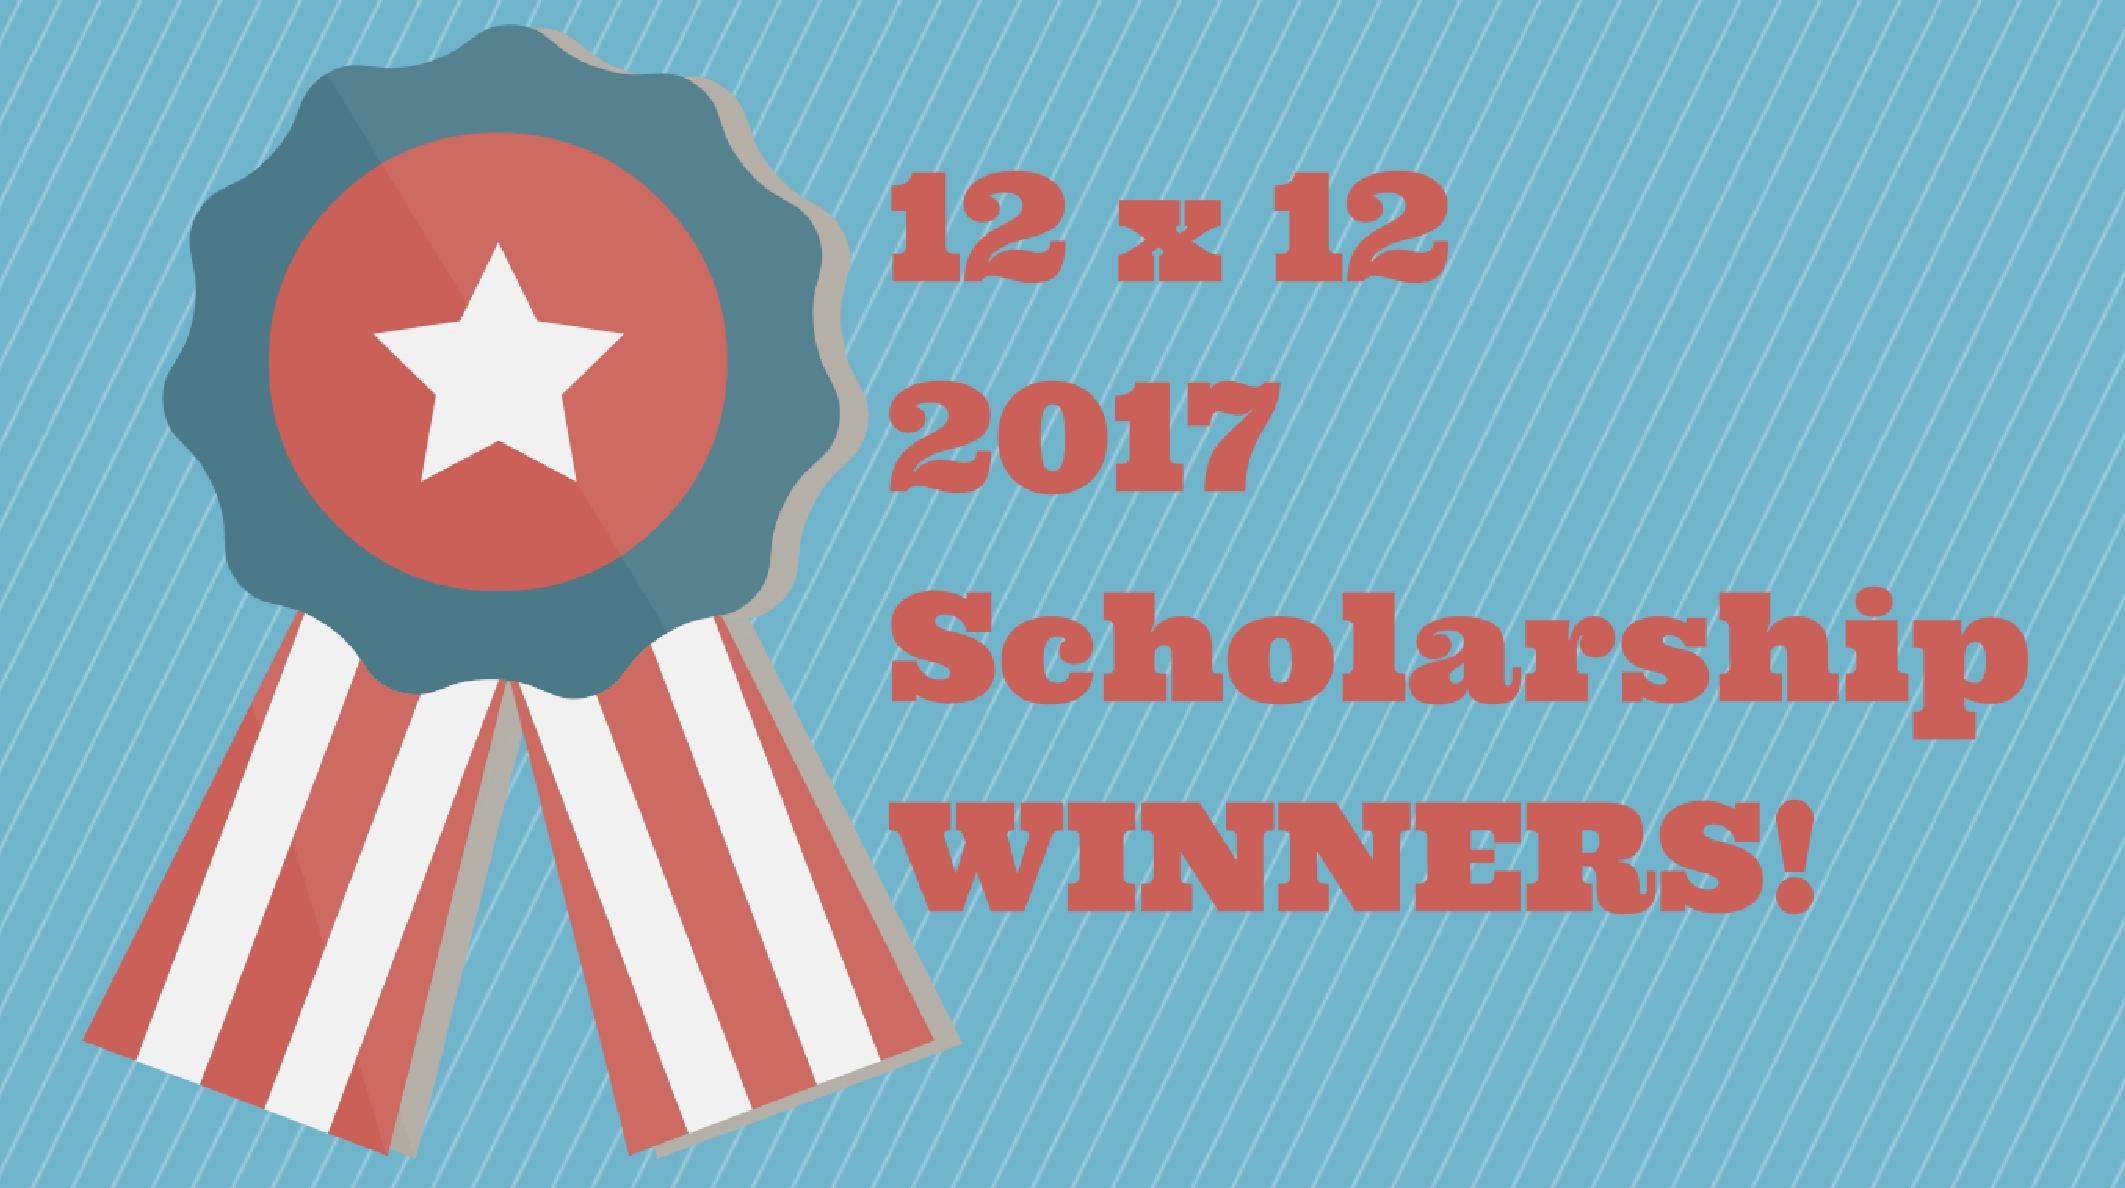 Meet Our 2017 Scholarship Winners!